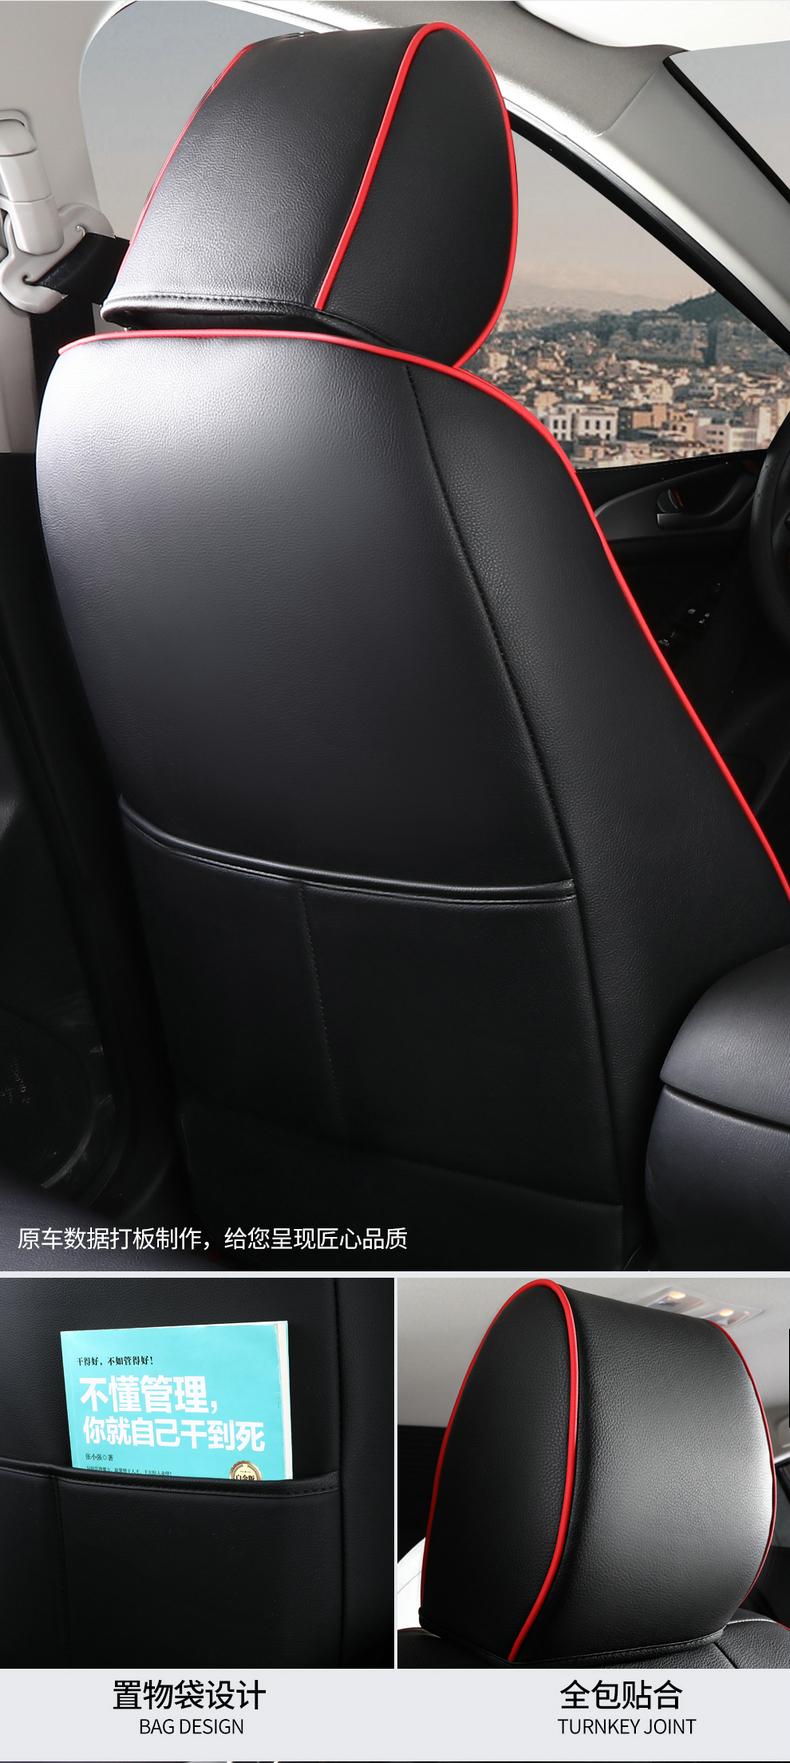 Áo ghế xe Mazda 3 2014 - 2018 - ảnh 14